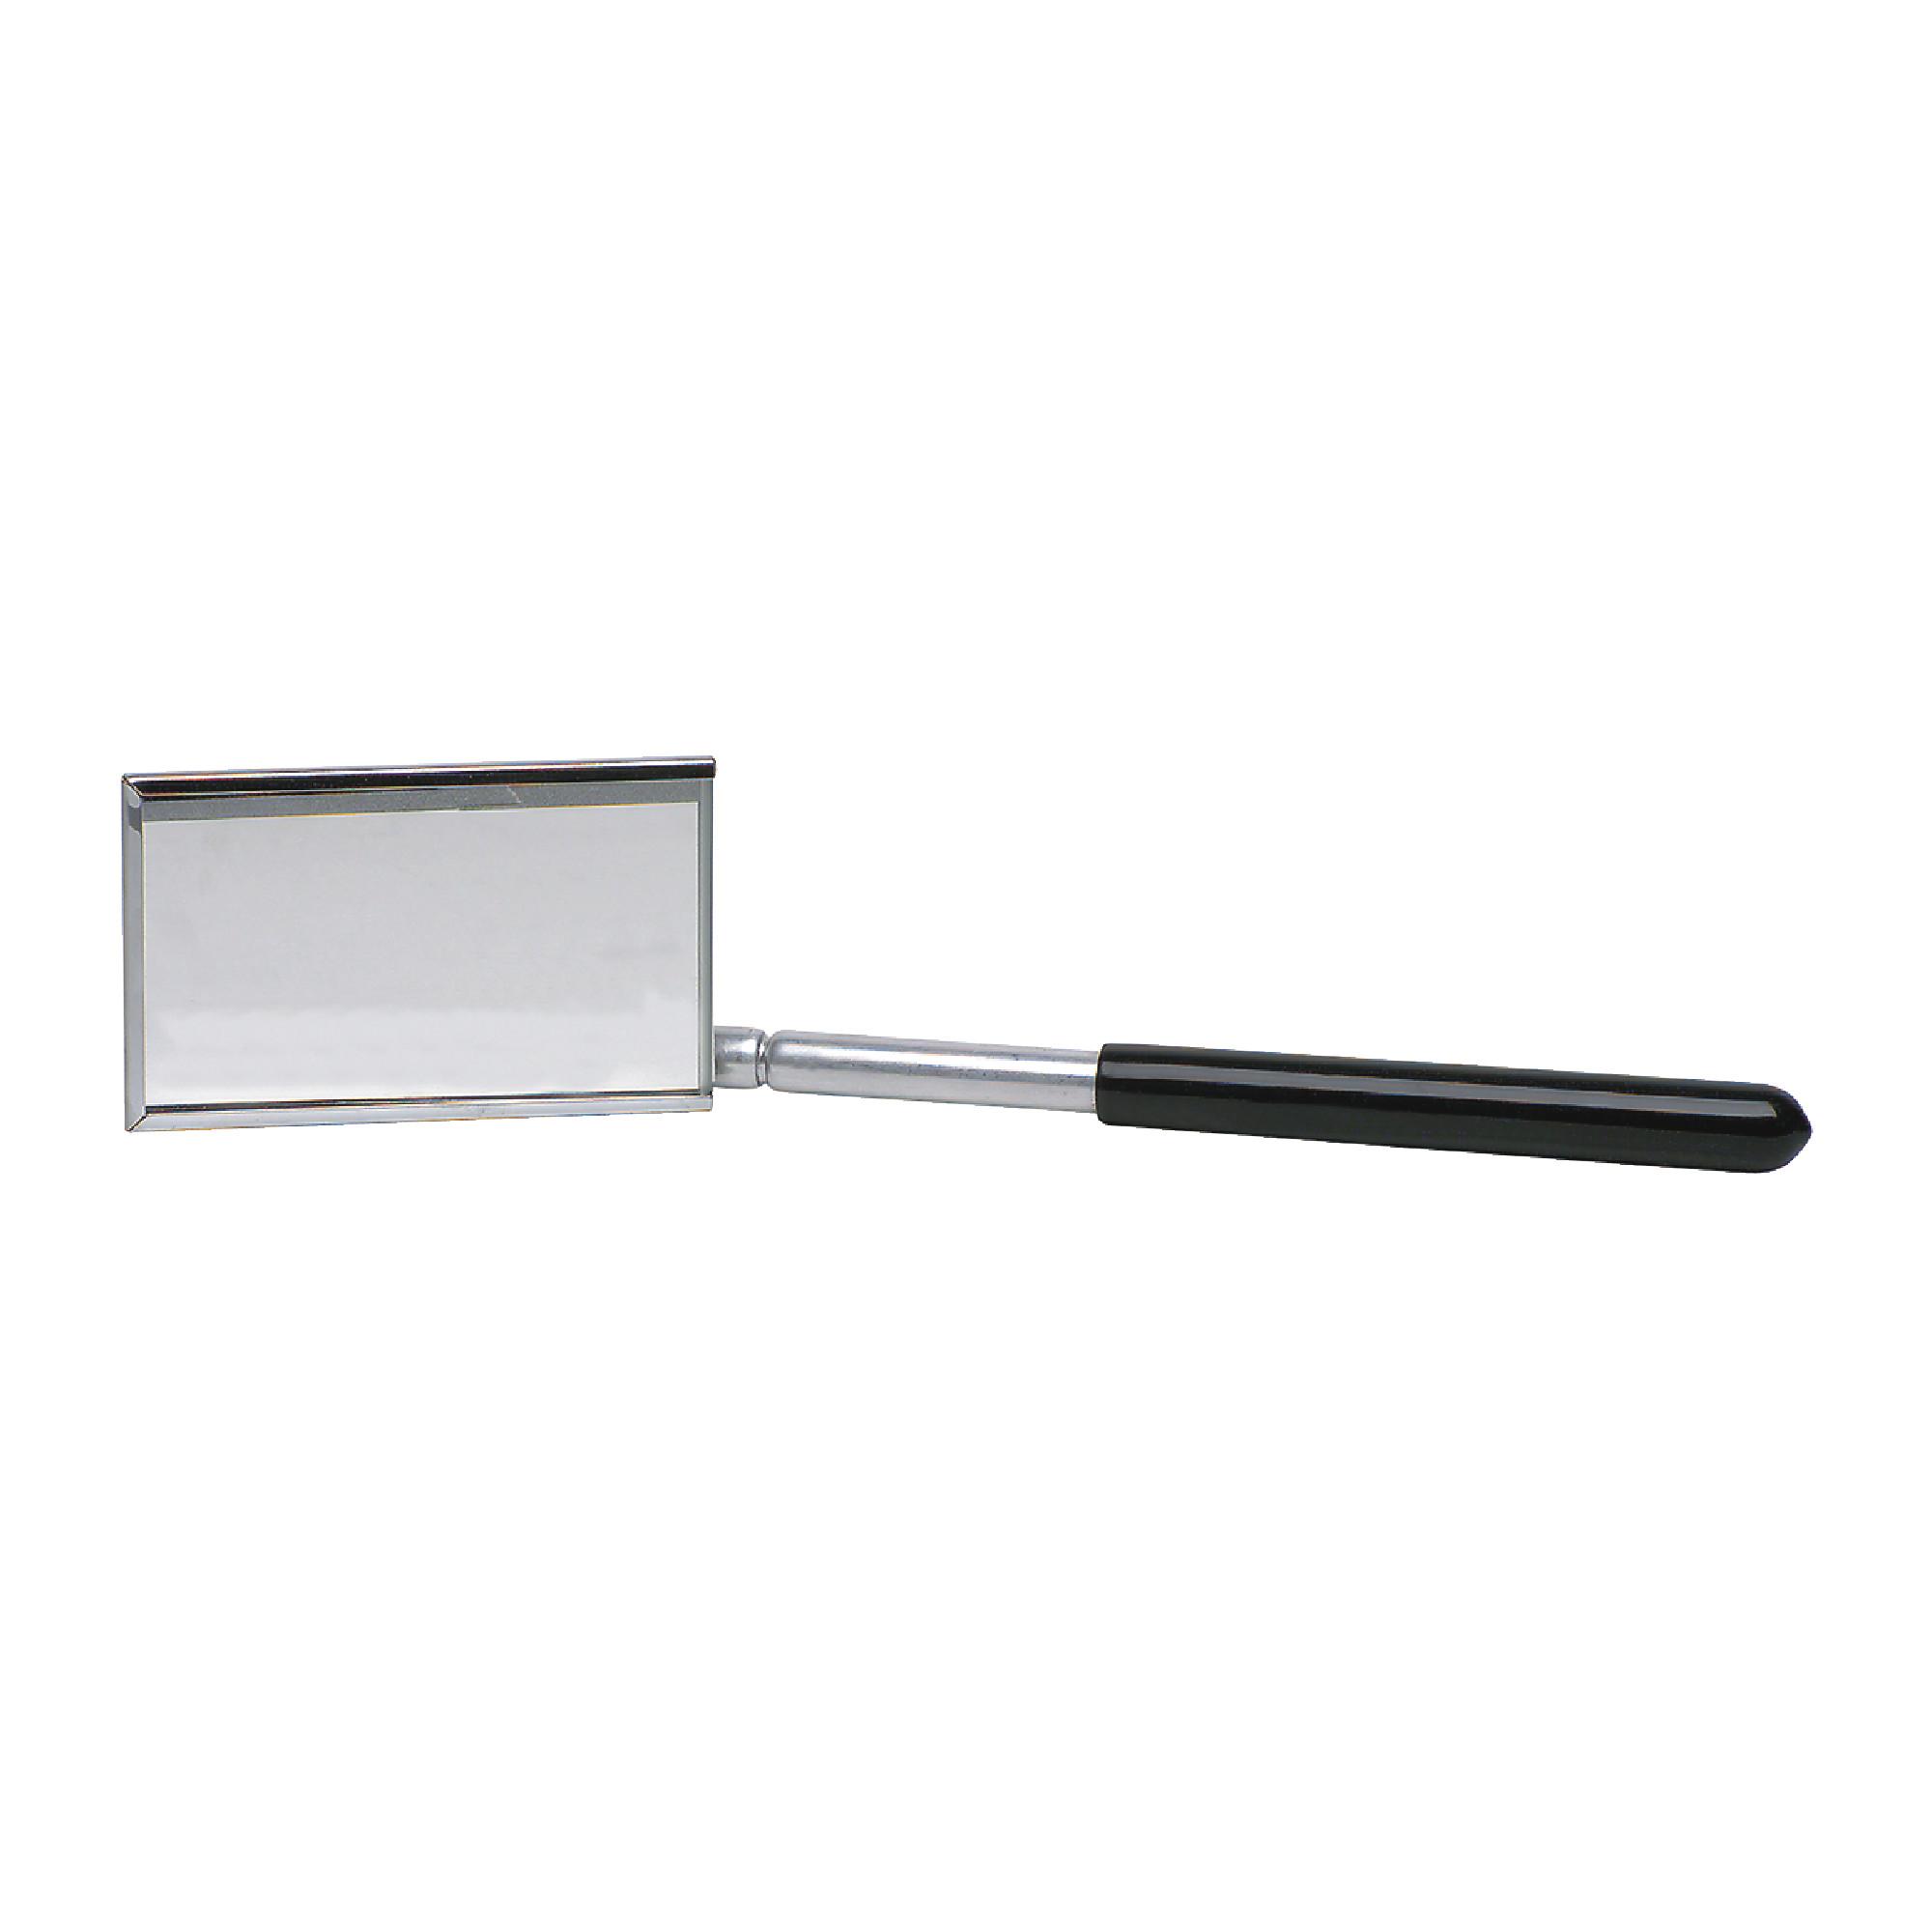 Telescoping Inspection Mirror